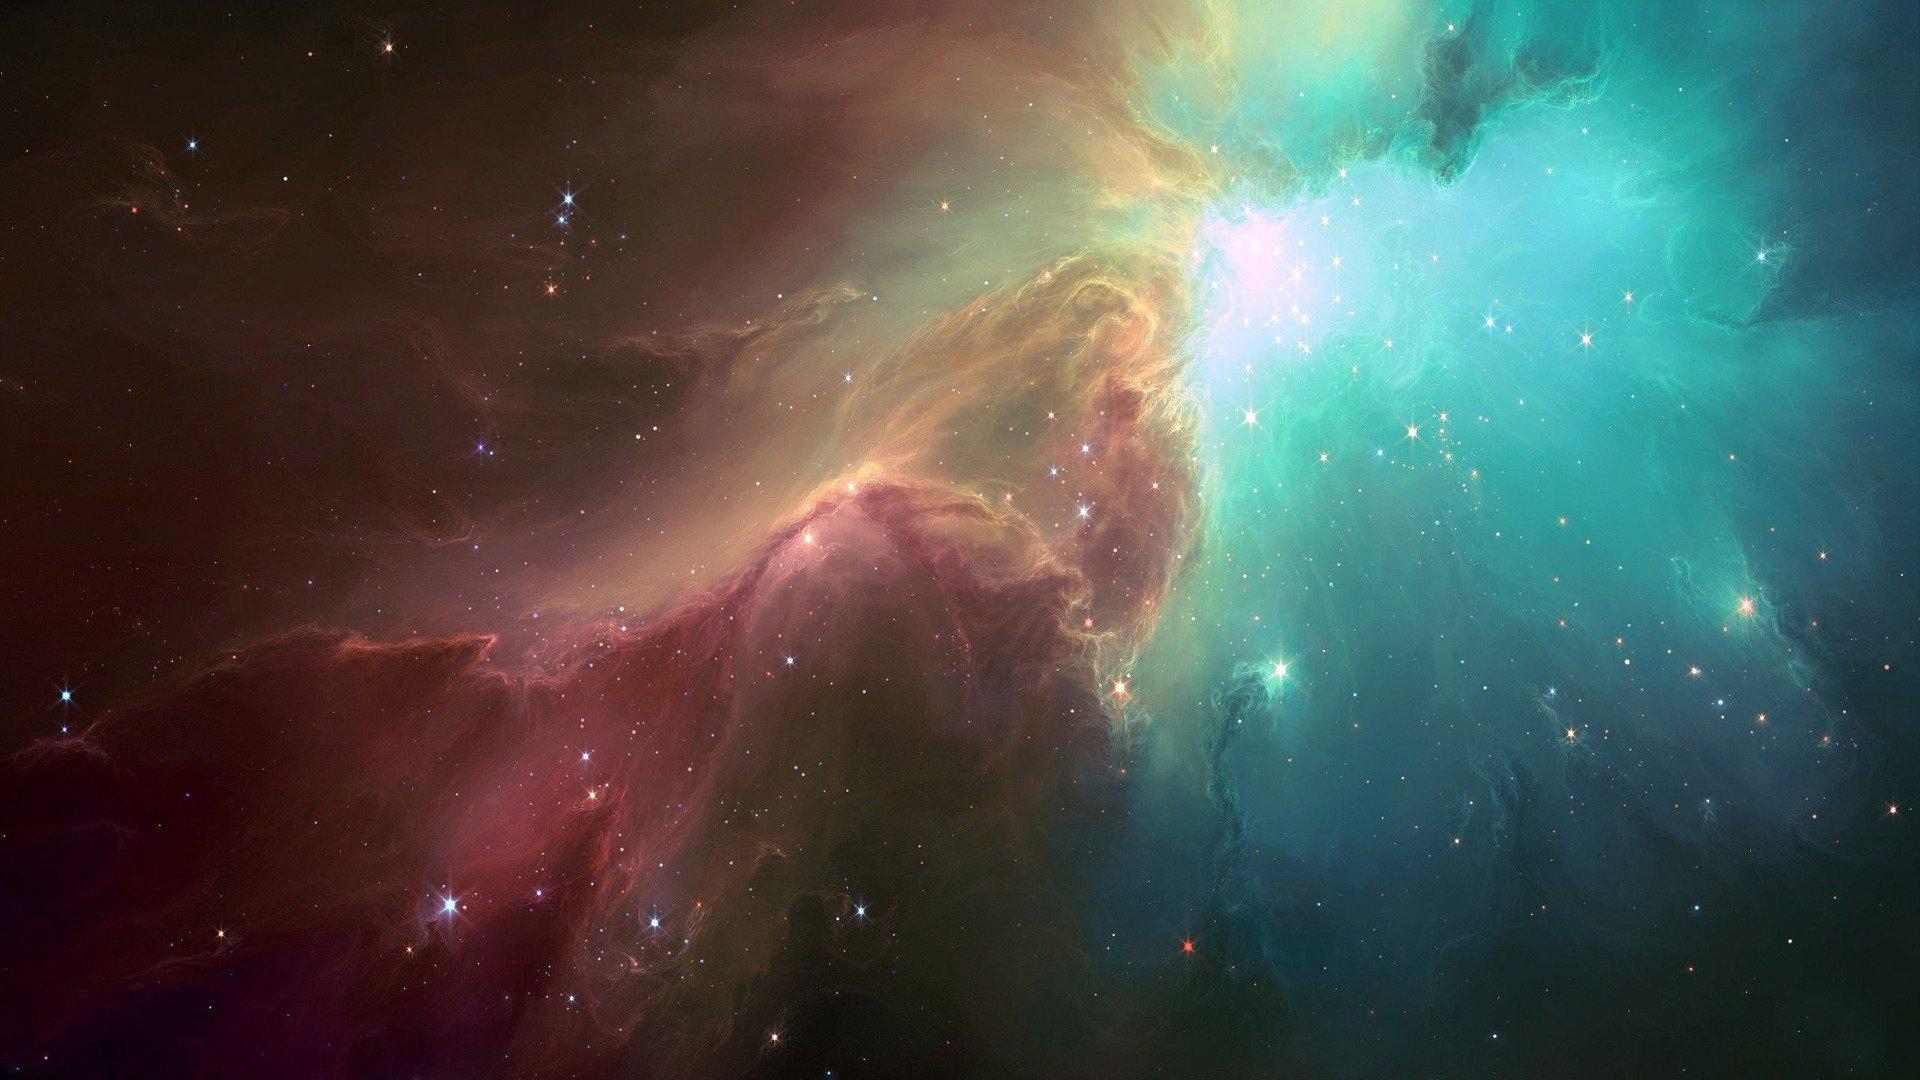 Eagle Nebula Wallpaper Hd Download